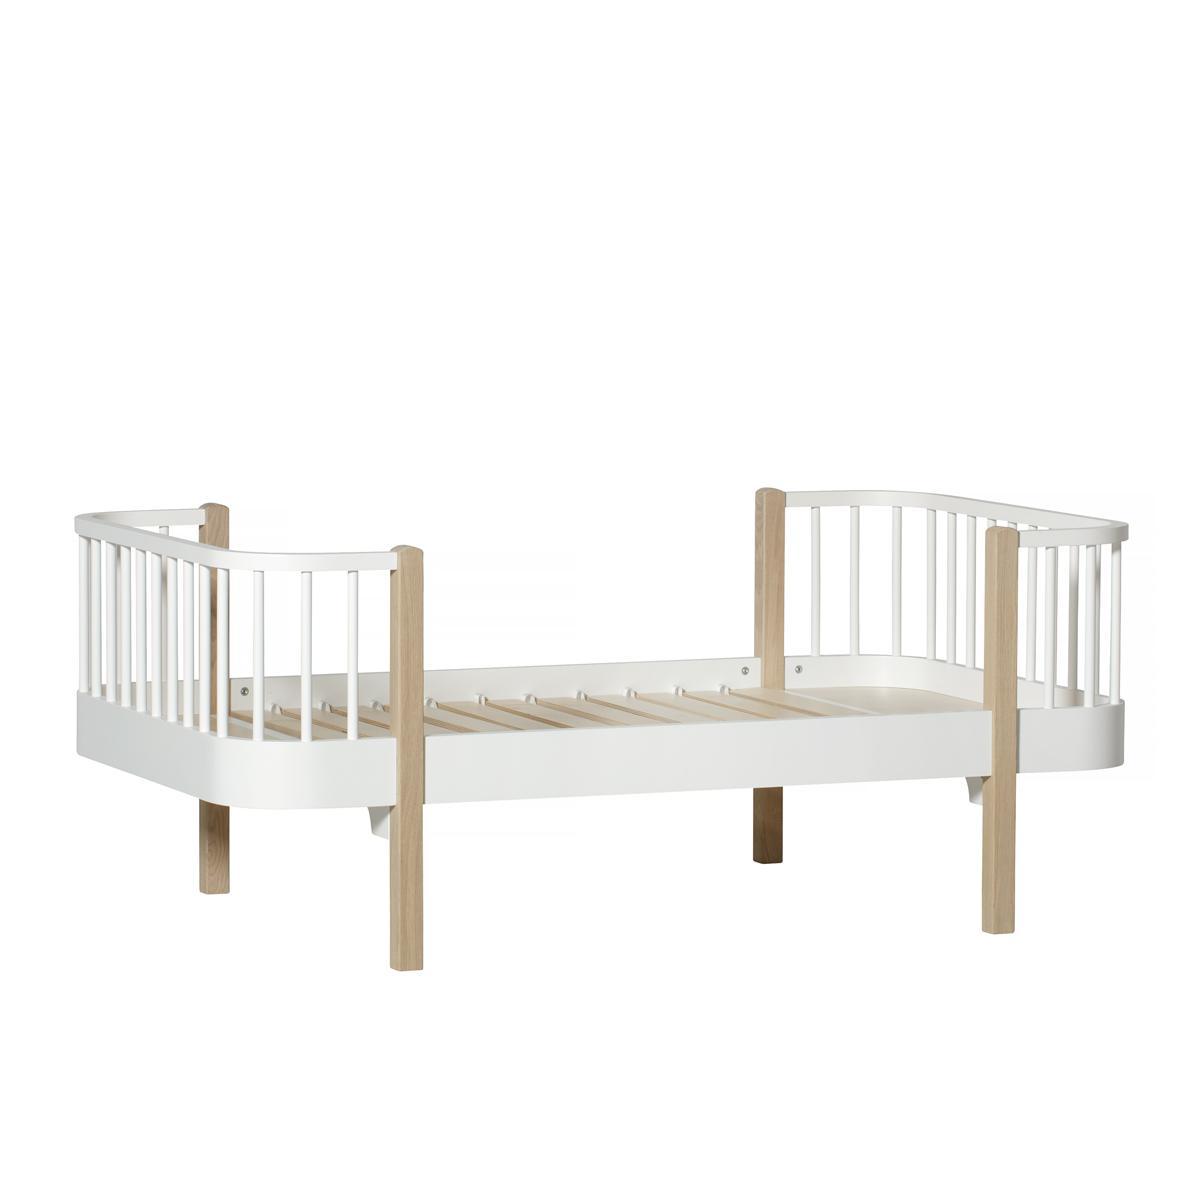 Cama individual evolutiva 90x160cm WOOD ORIGINAL Oliver Furniture blanco-roble